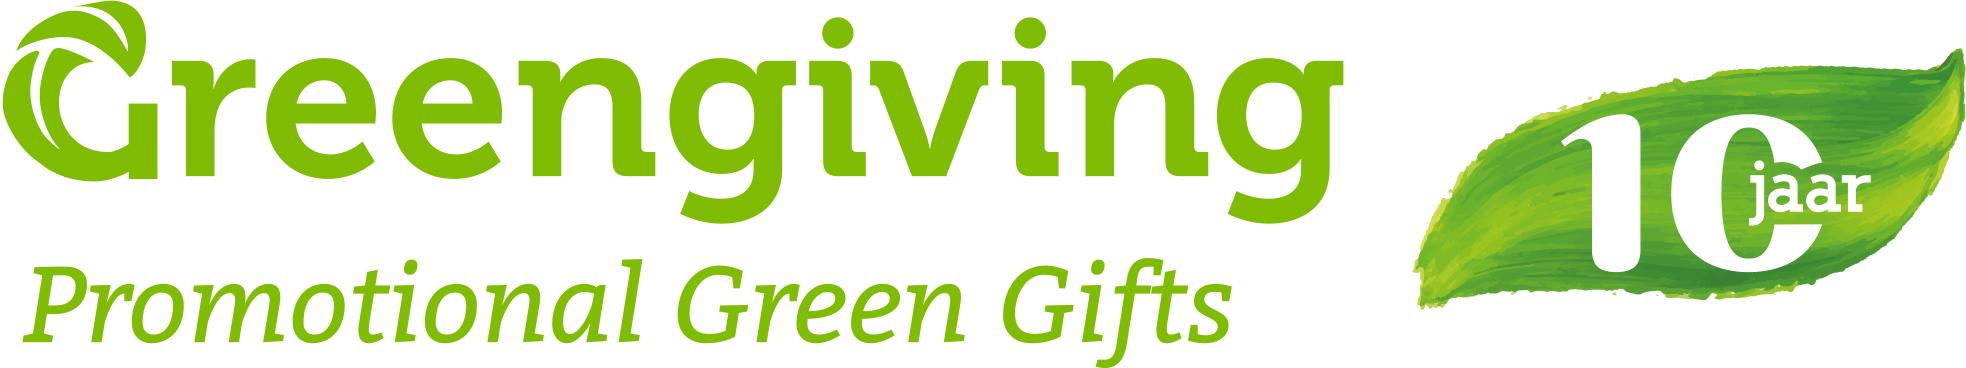 Greengiving logo incl. pay off en 10 jaar embleem ENG.jpg